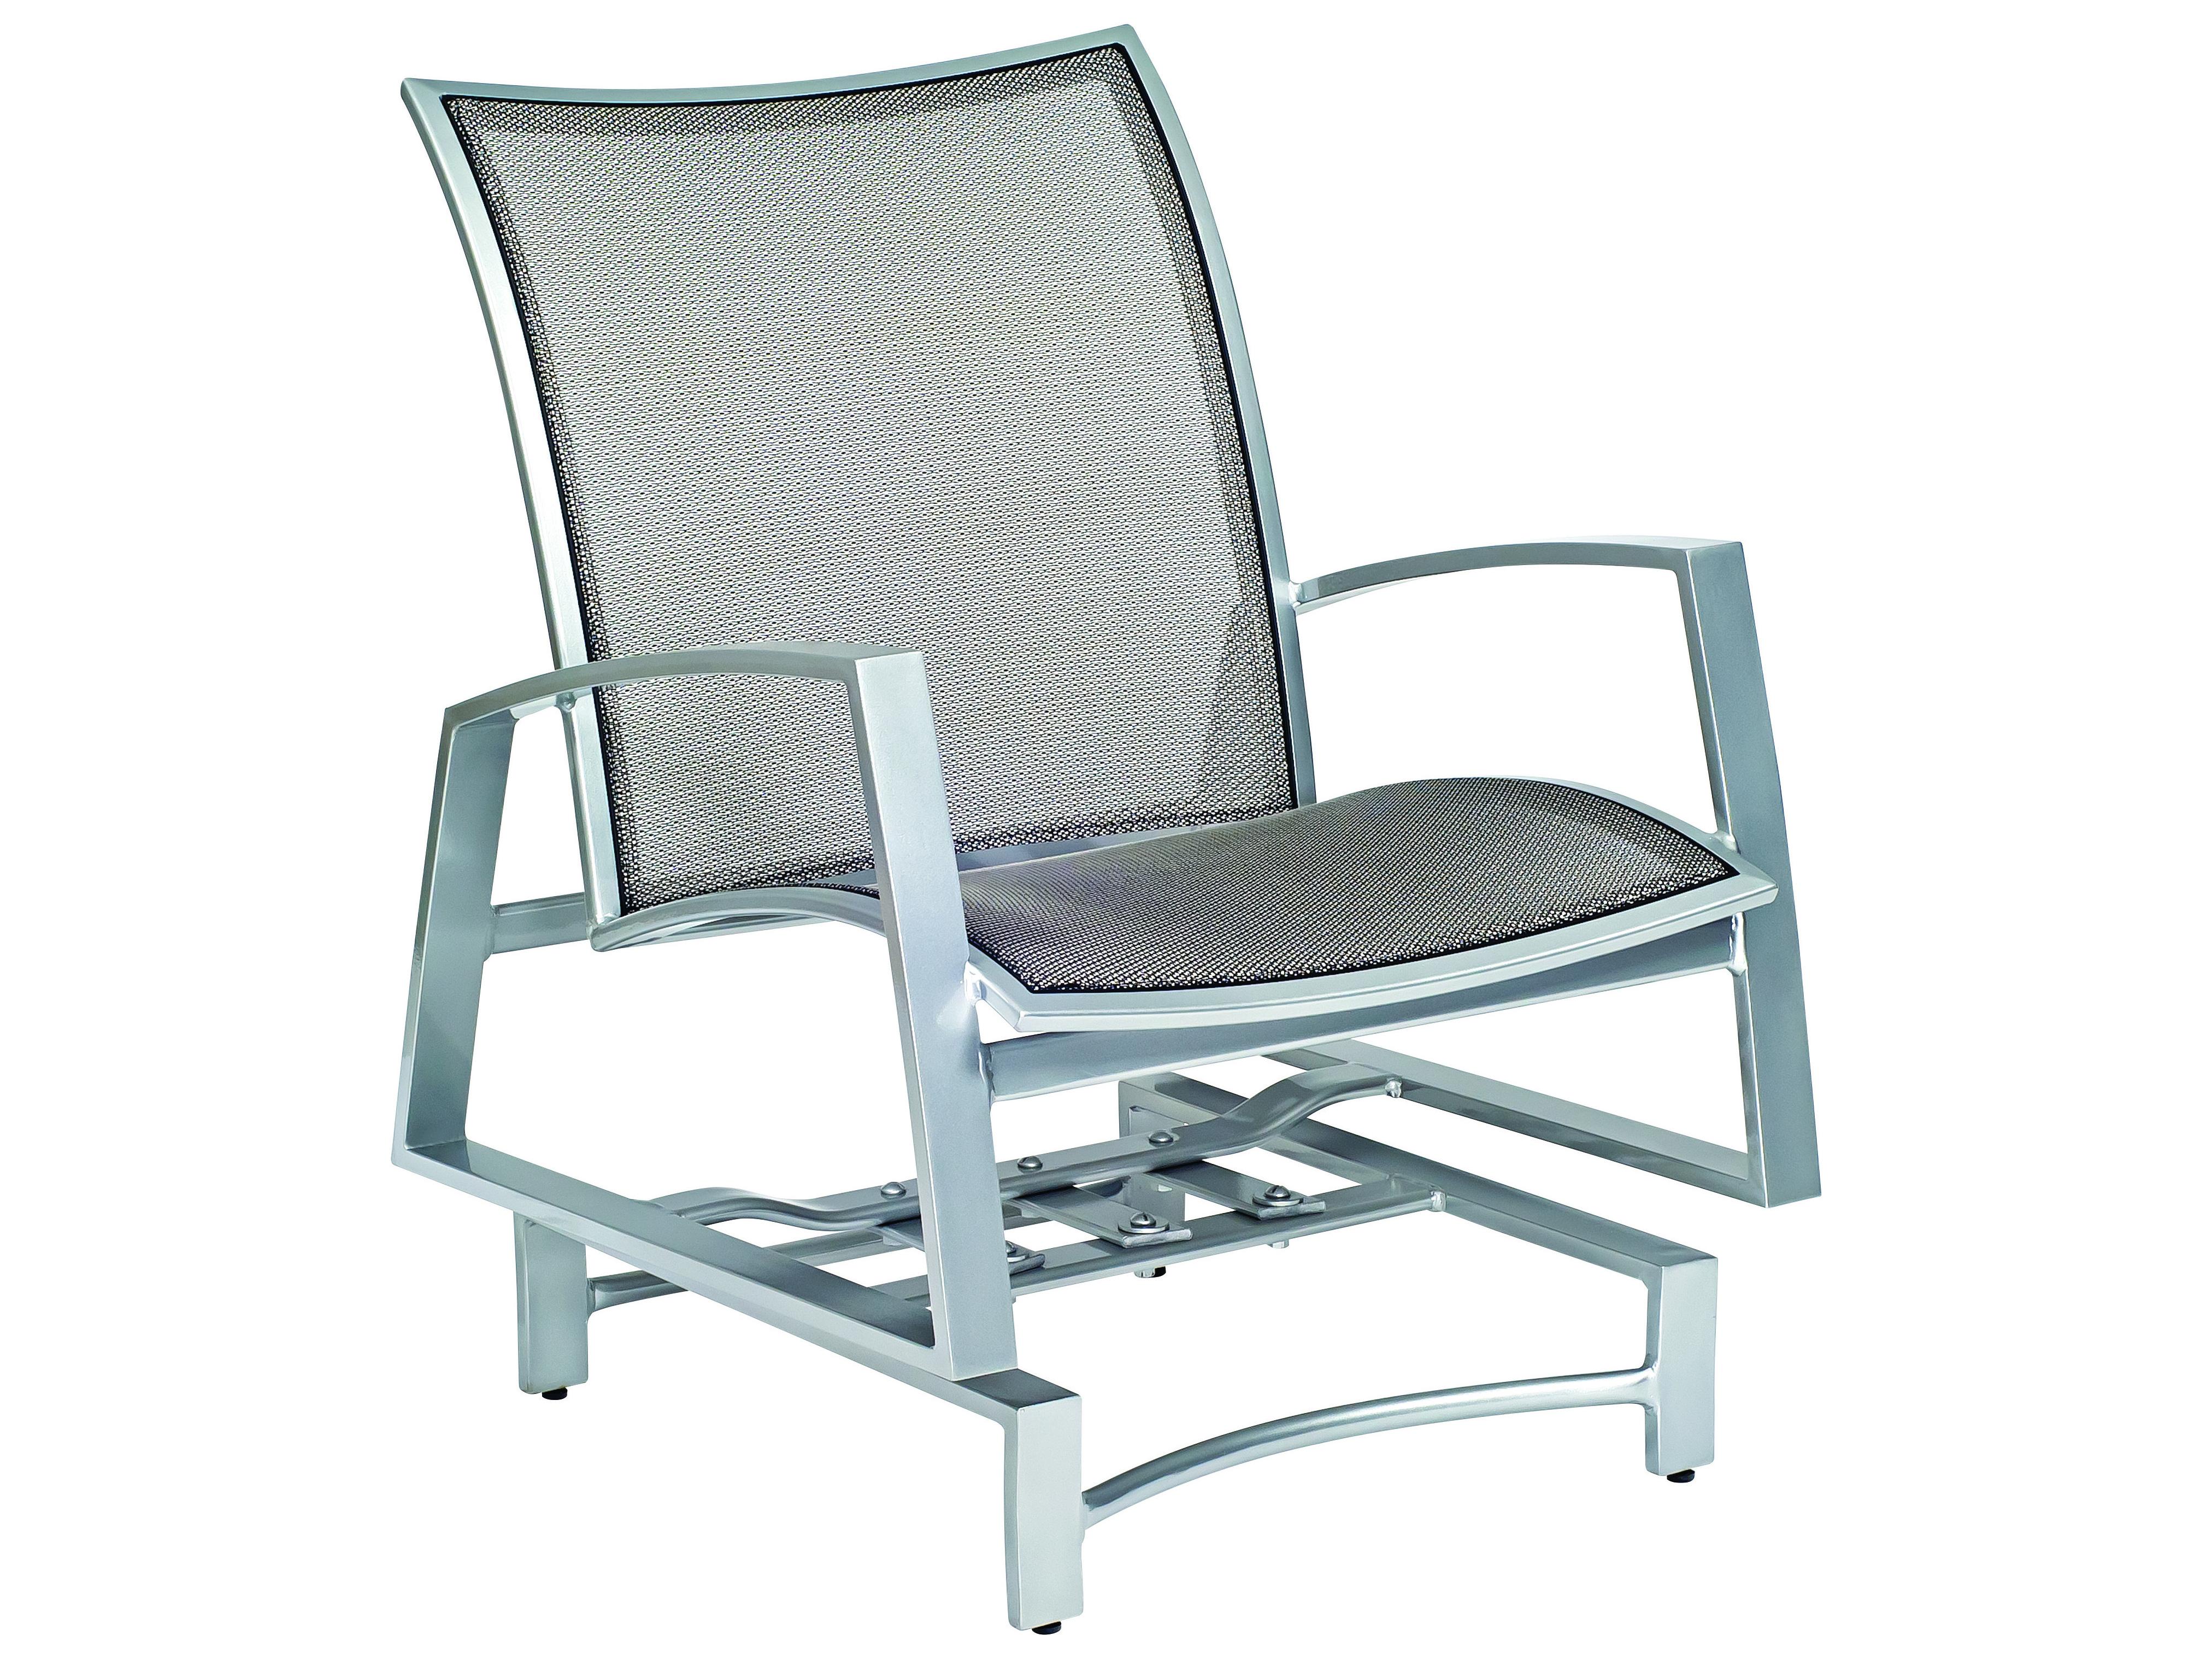 Woodard Wyatt Flex Aluminum Spring Lounge Chair Wr520465